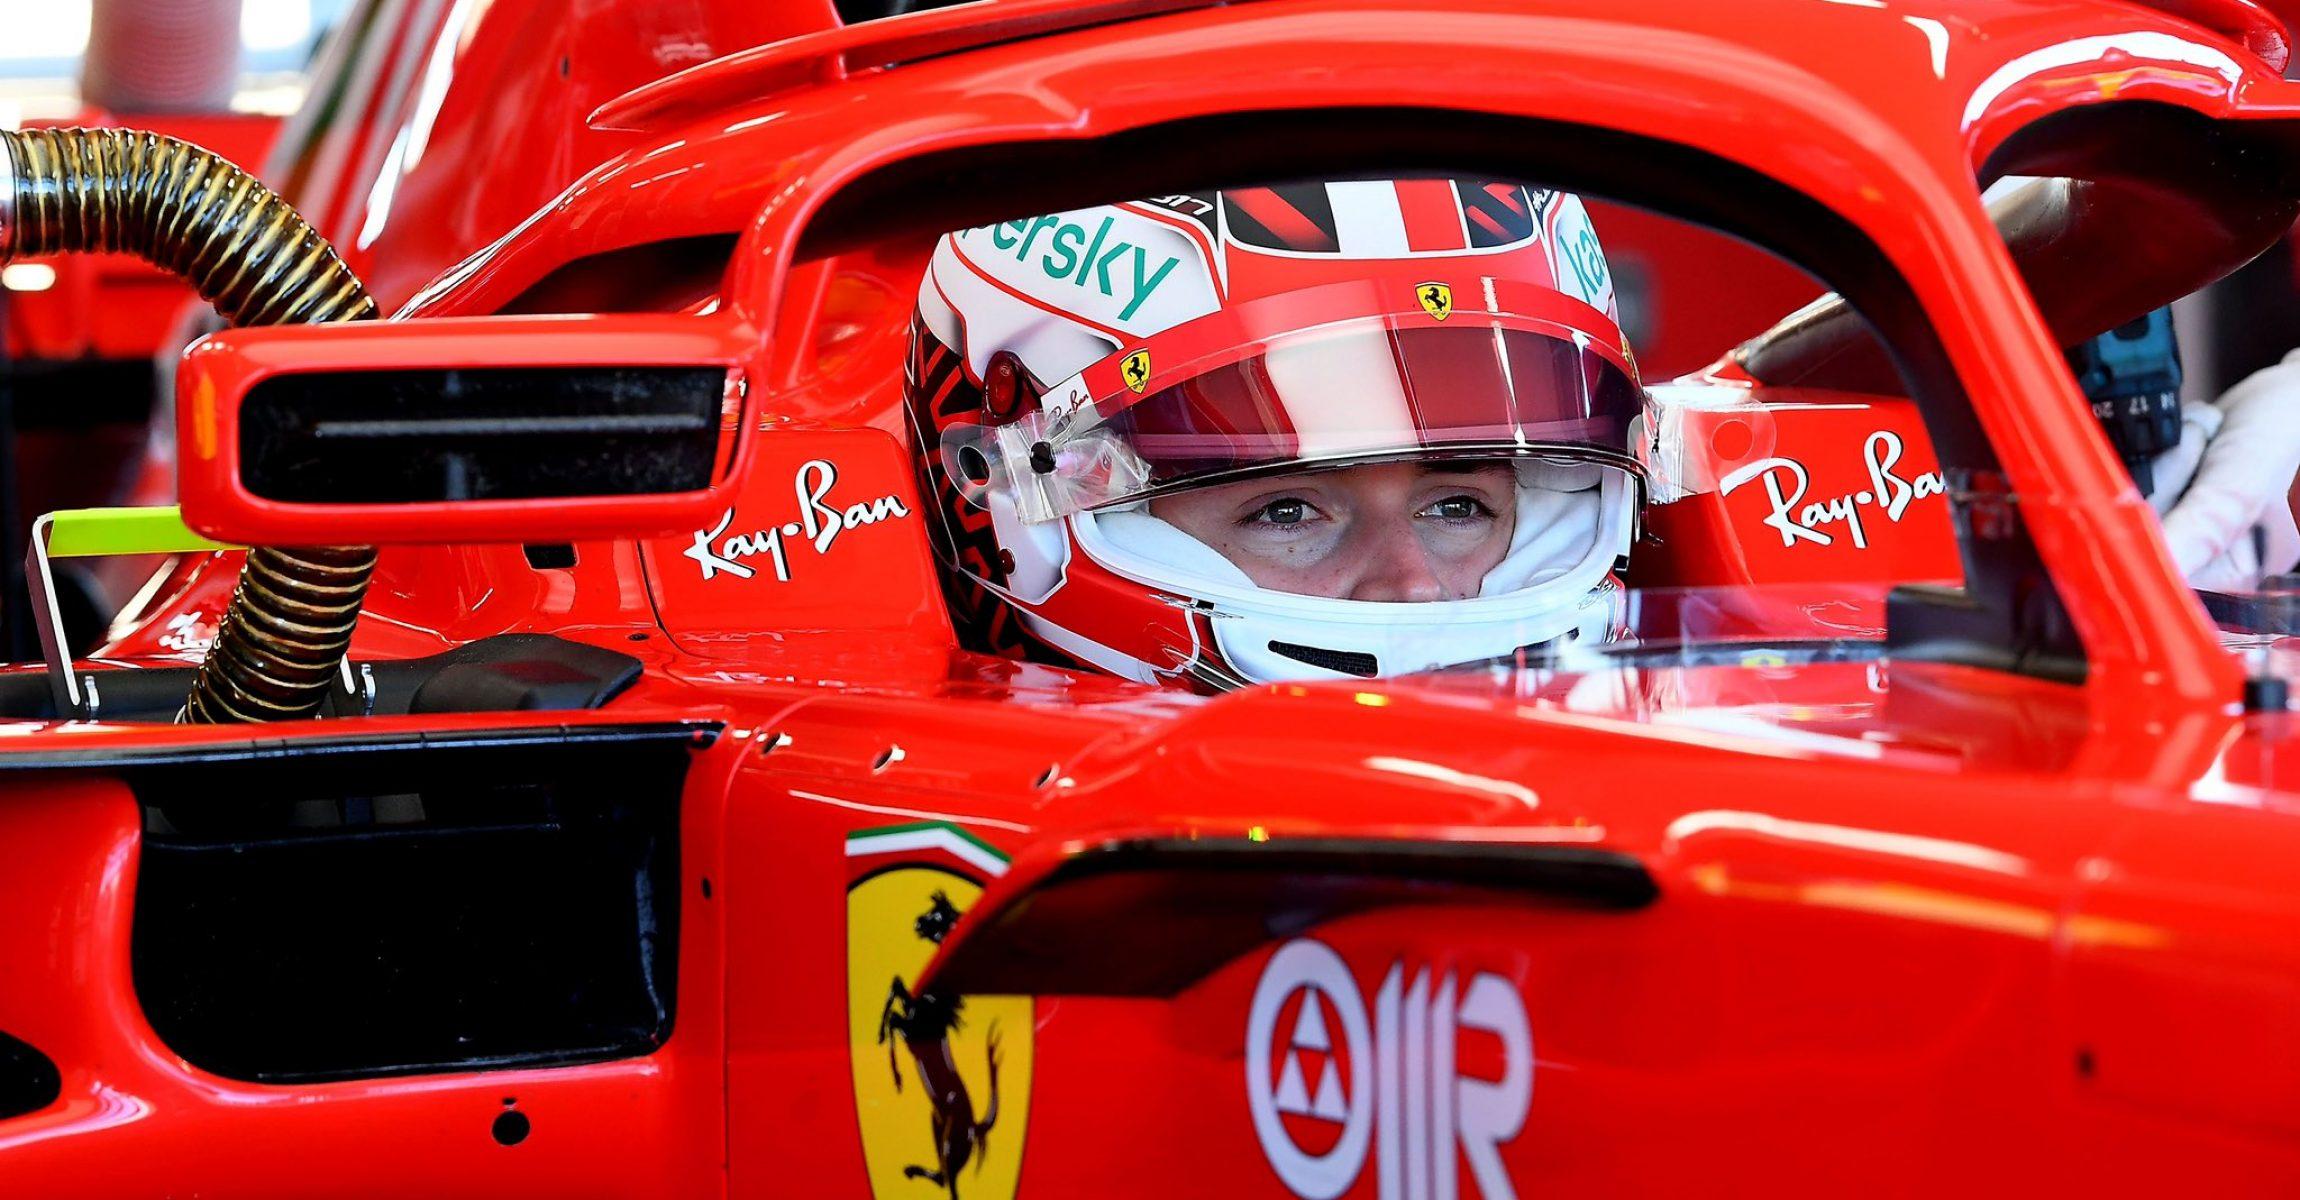 Charles Leclerc, Ferrari, SF71H, Fiorano, 26.01.2021